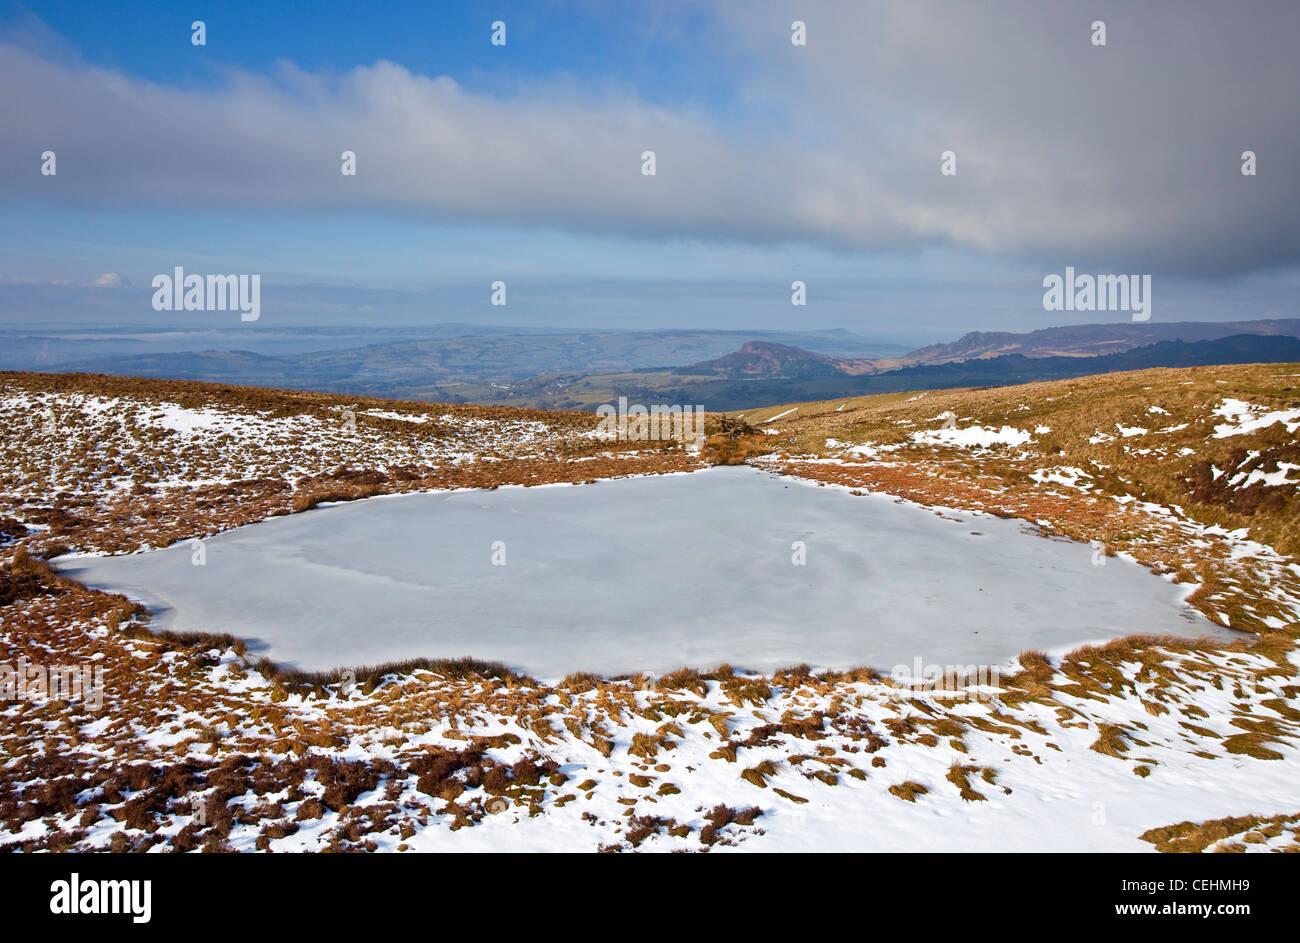 Winter on Peak District National Park Staffordshire Moorlands England UK - Stock Image